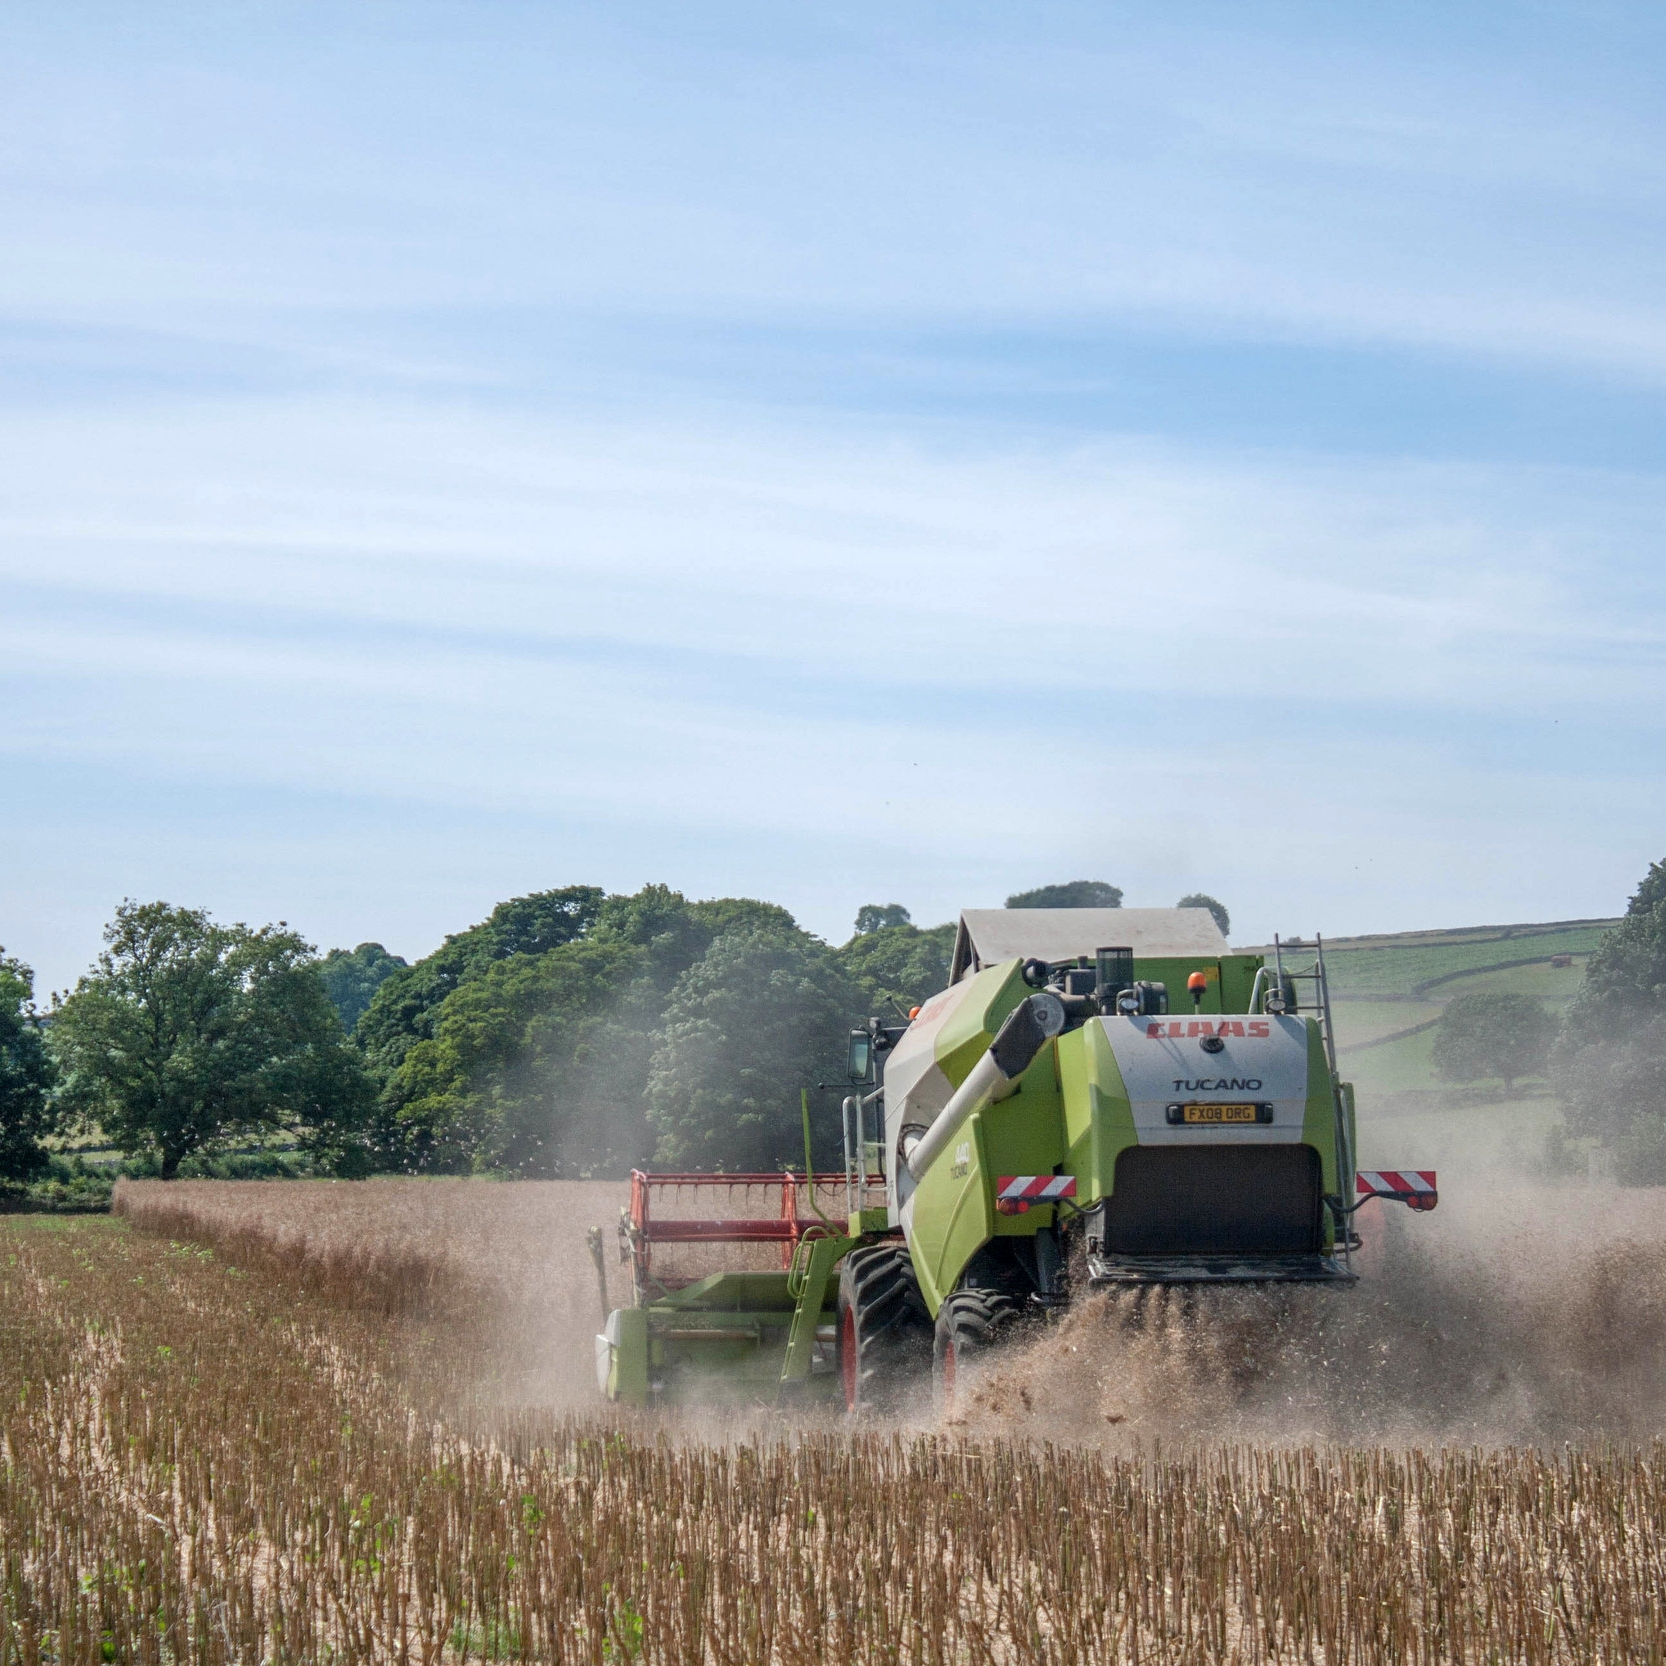 harvesting rapeseed oil